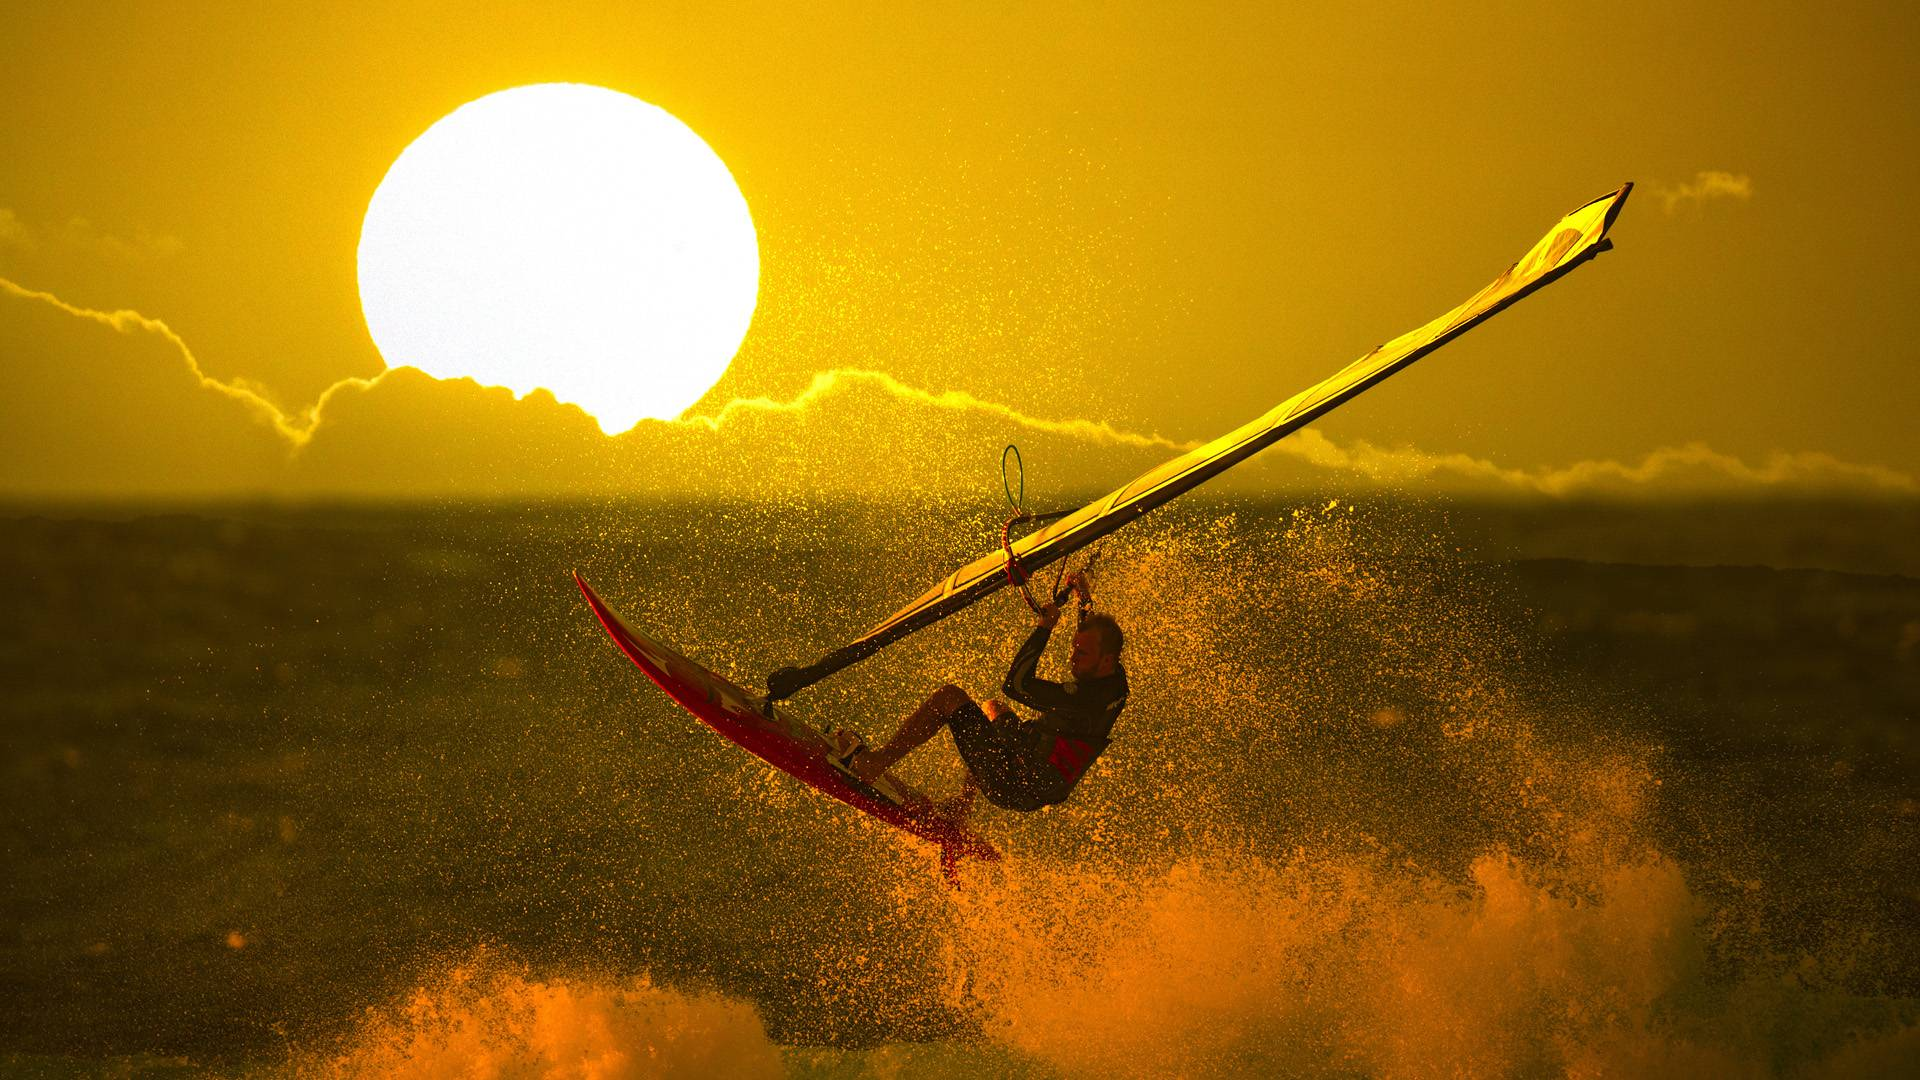 обои Виндсёрфинг, закат, большое солнце картинки фото